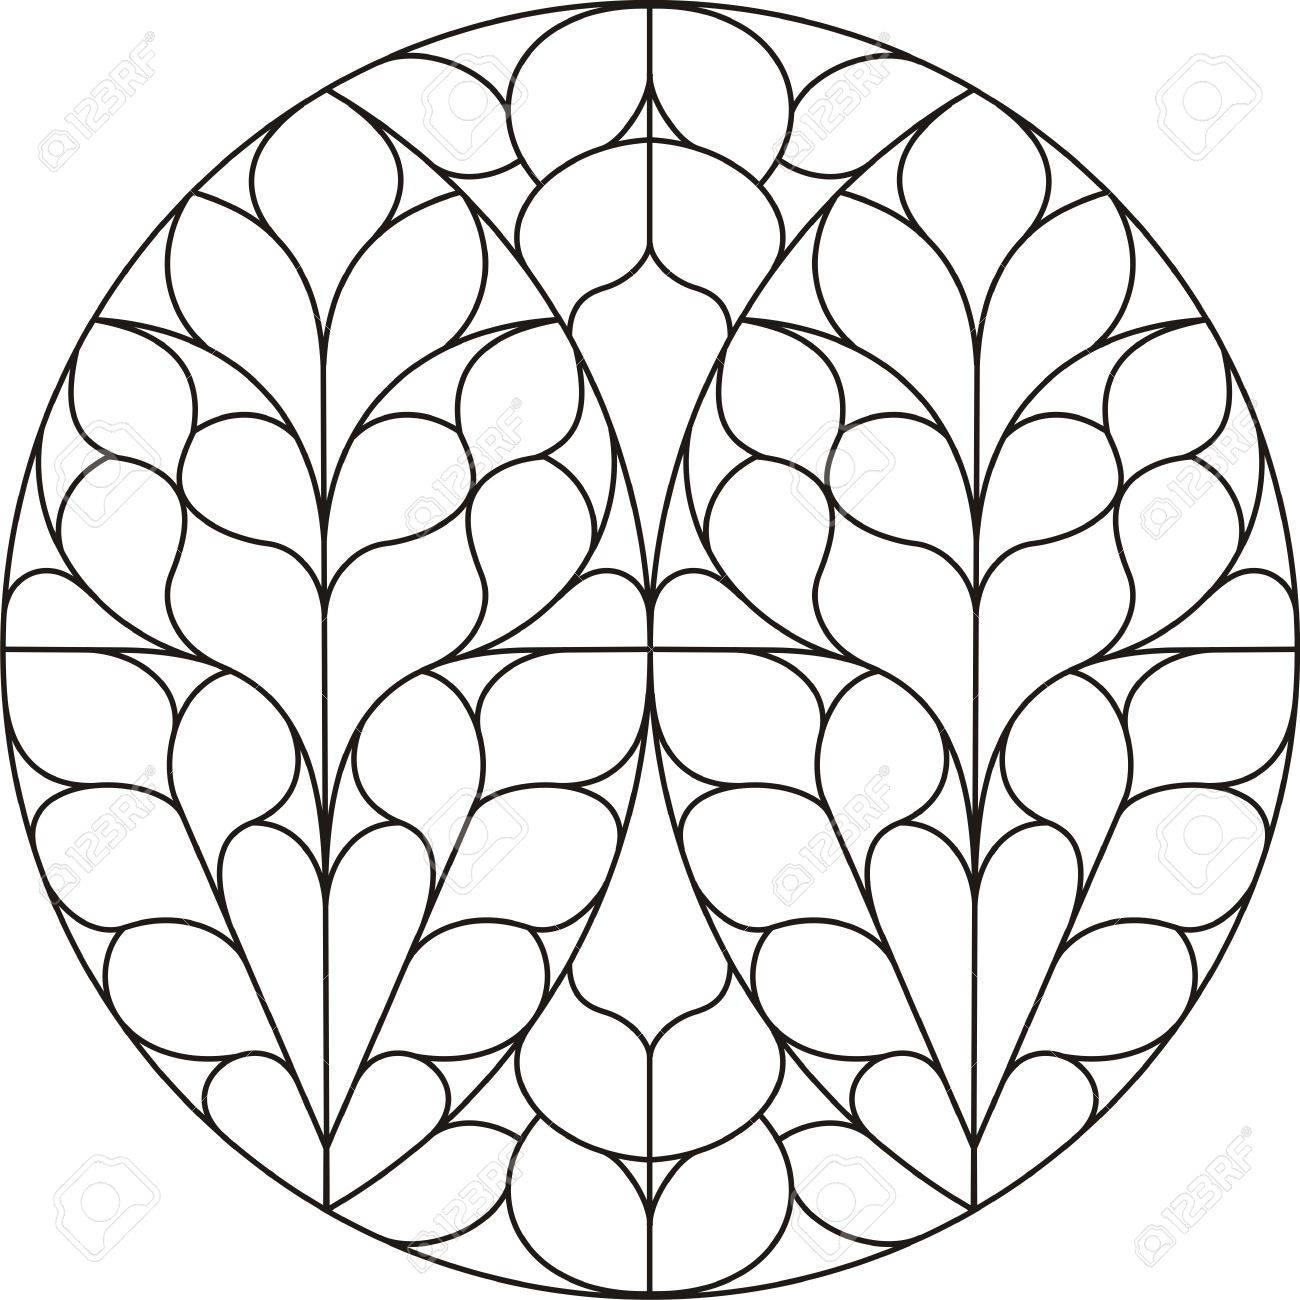 Circular cathedral window - 8798089